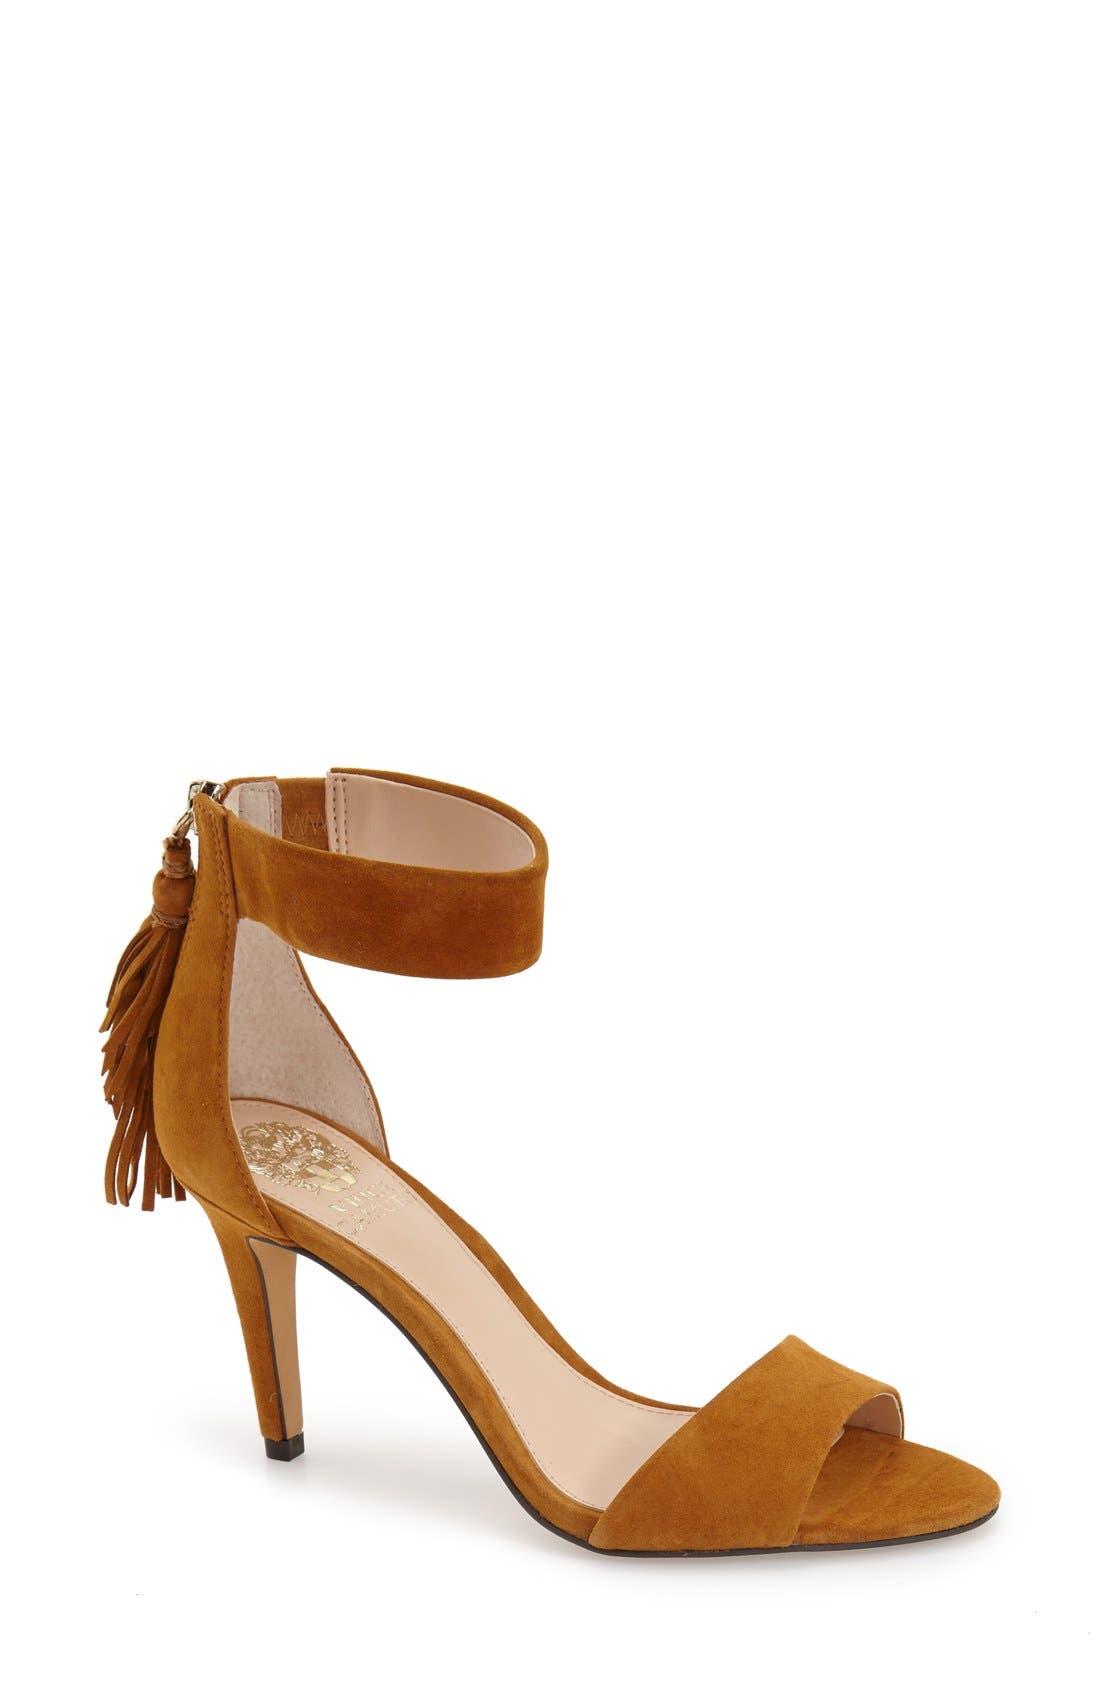 Main Image - Vince Camuto 'Catalyn' Sandal (Women)